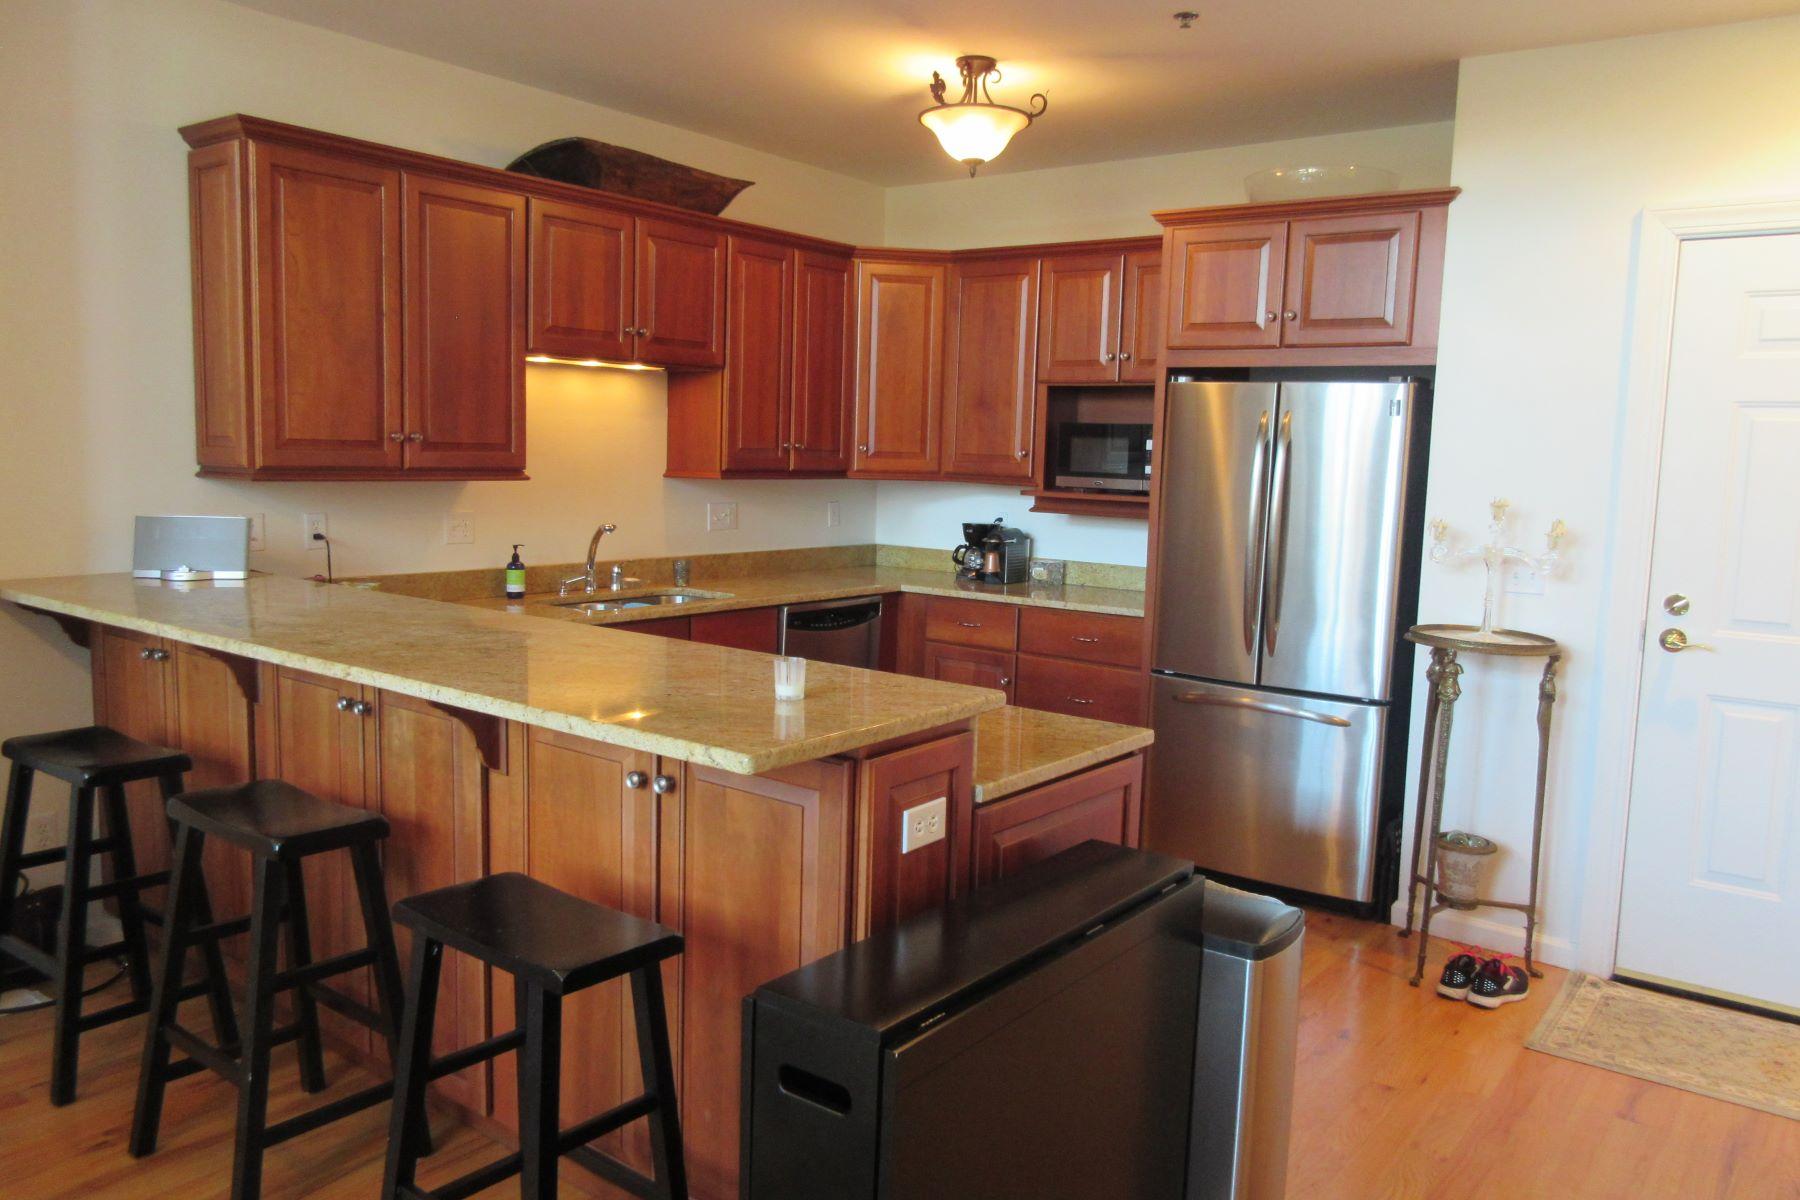 Condominiums vì Bán tại 1 Indian Neck Avenue 6, Branford, Connecticut 06405 Hoa Kỳ